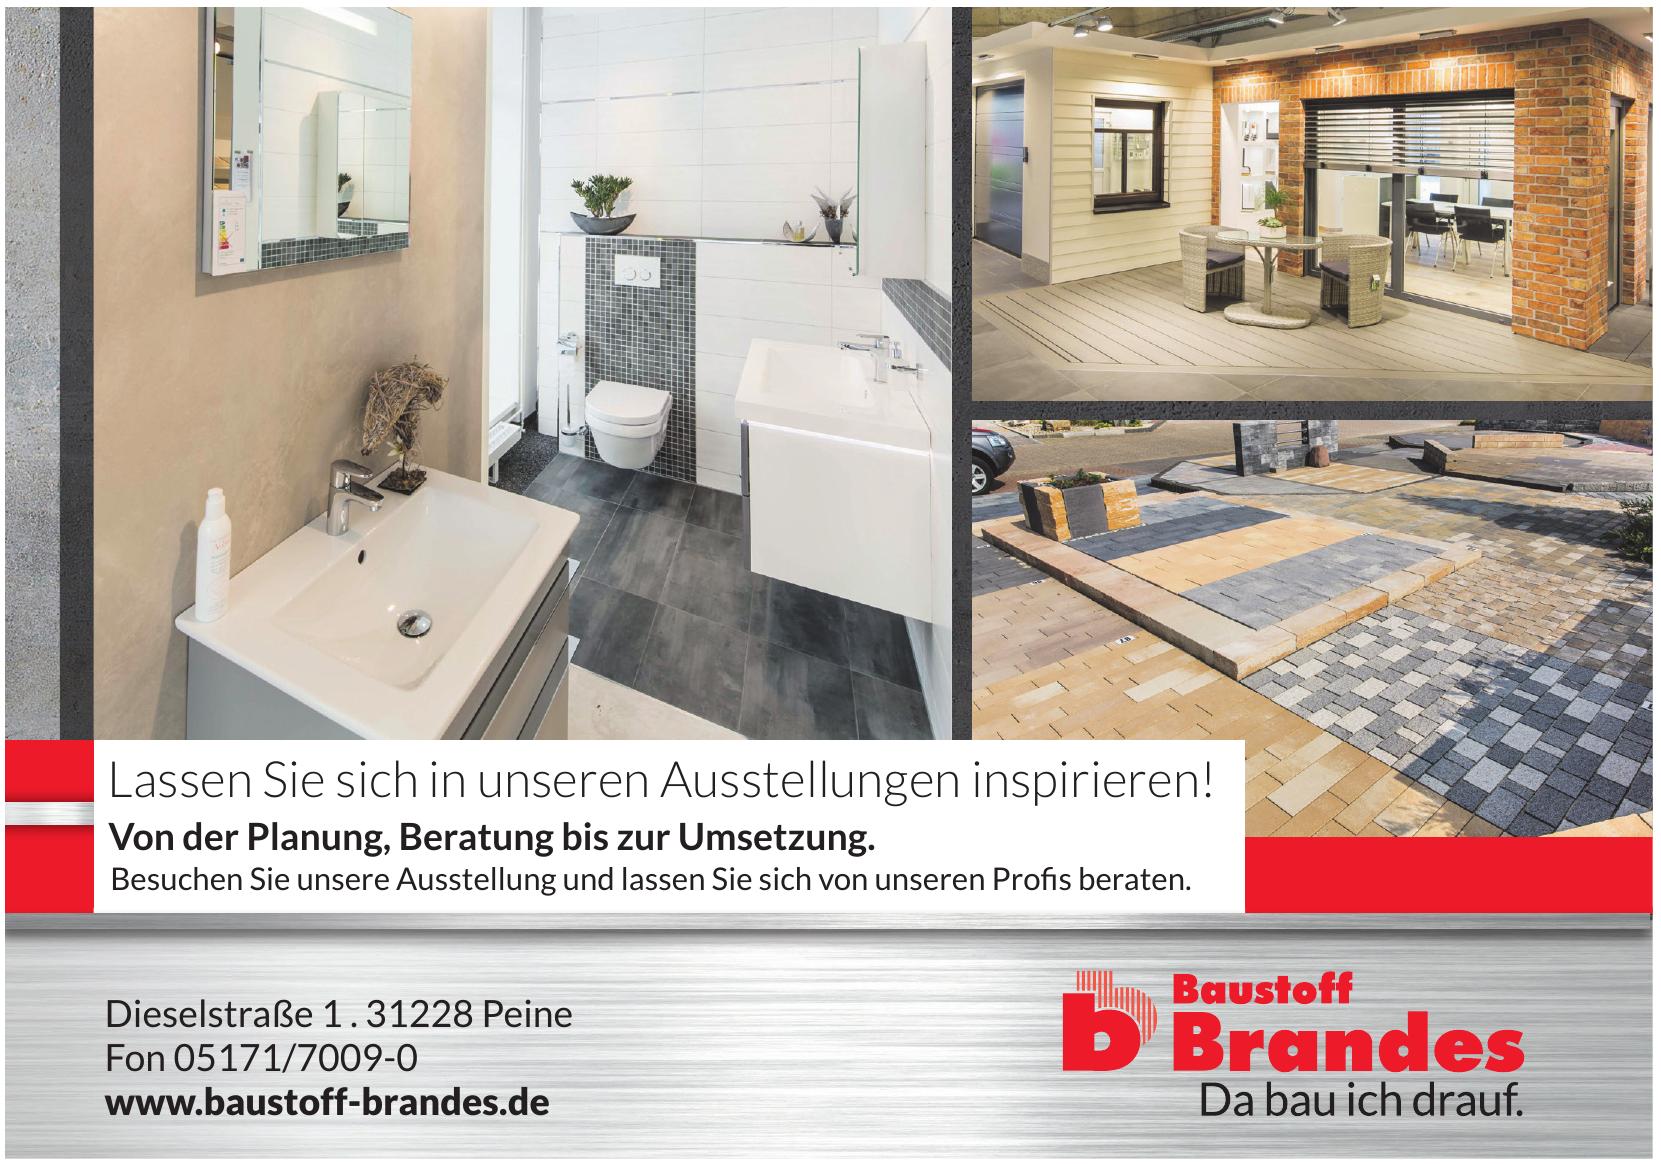 Baustoff Brandes GmbH